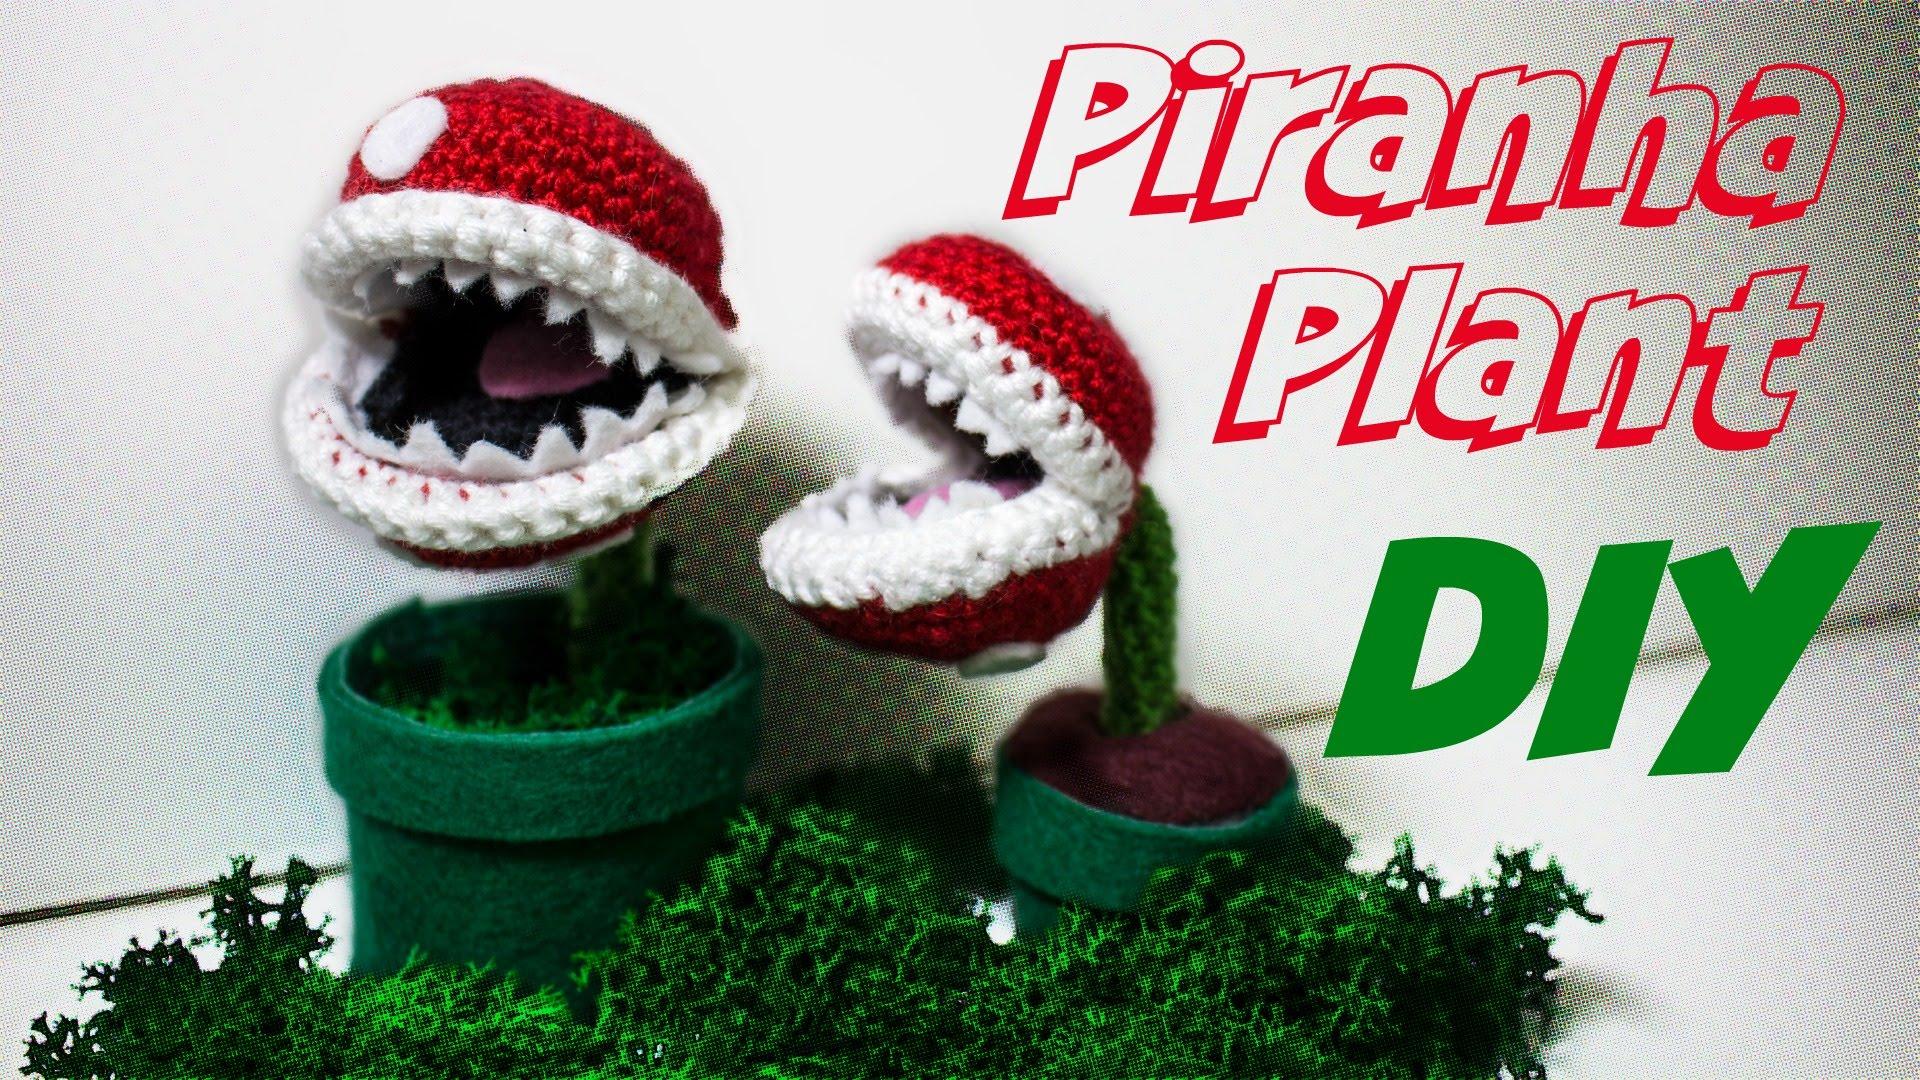 Piranha Pflanze Super Mario Justmikode Gratis Anleitungen Zum